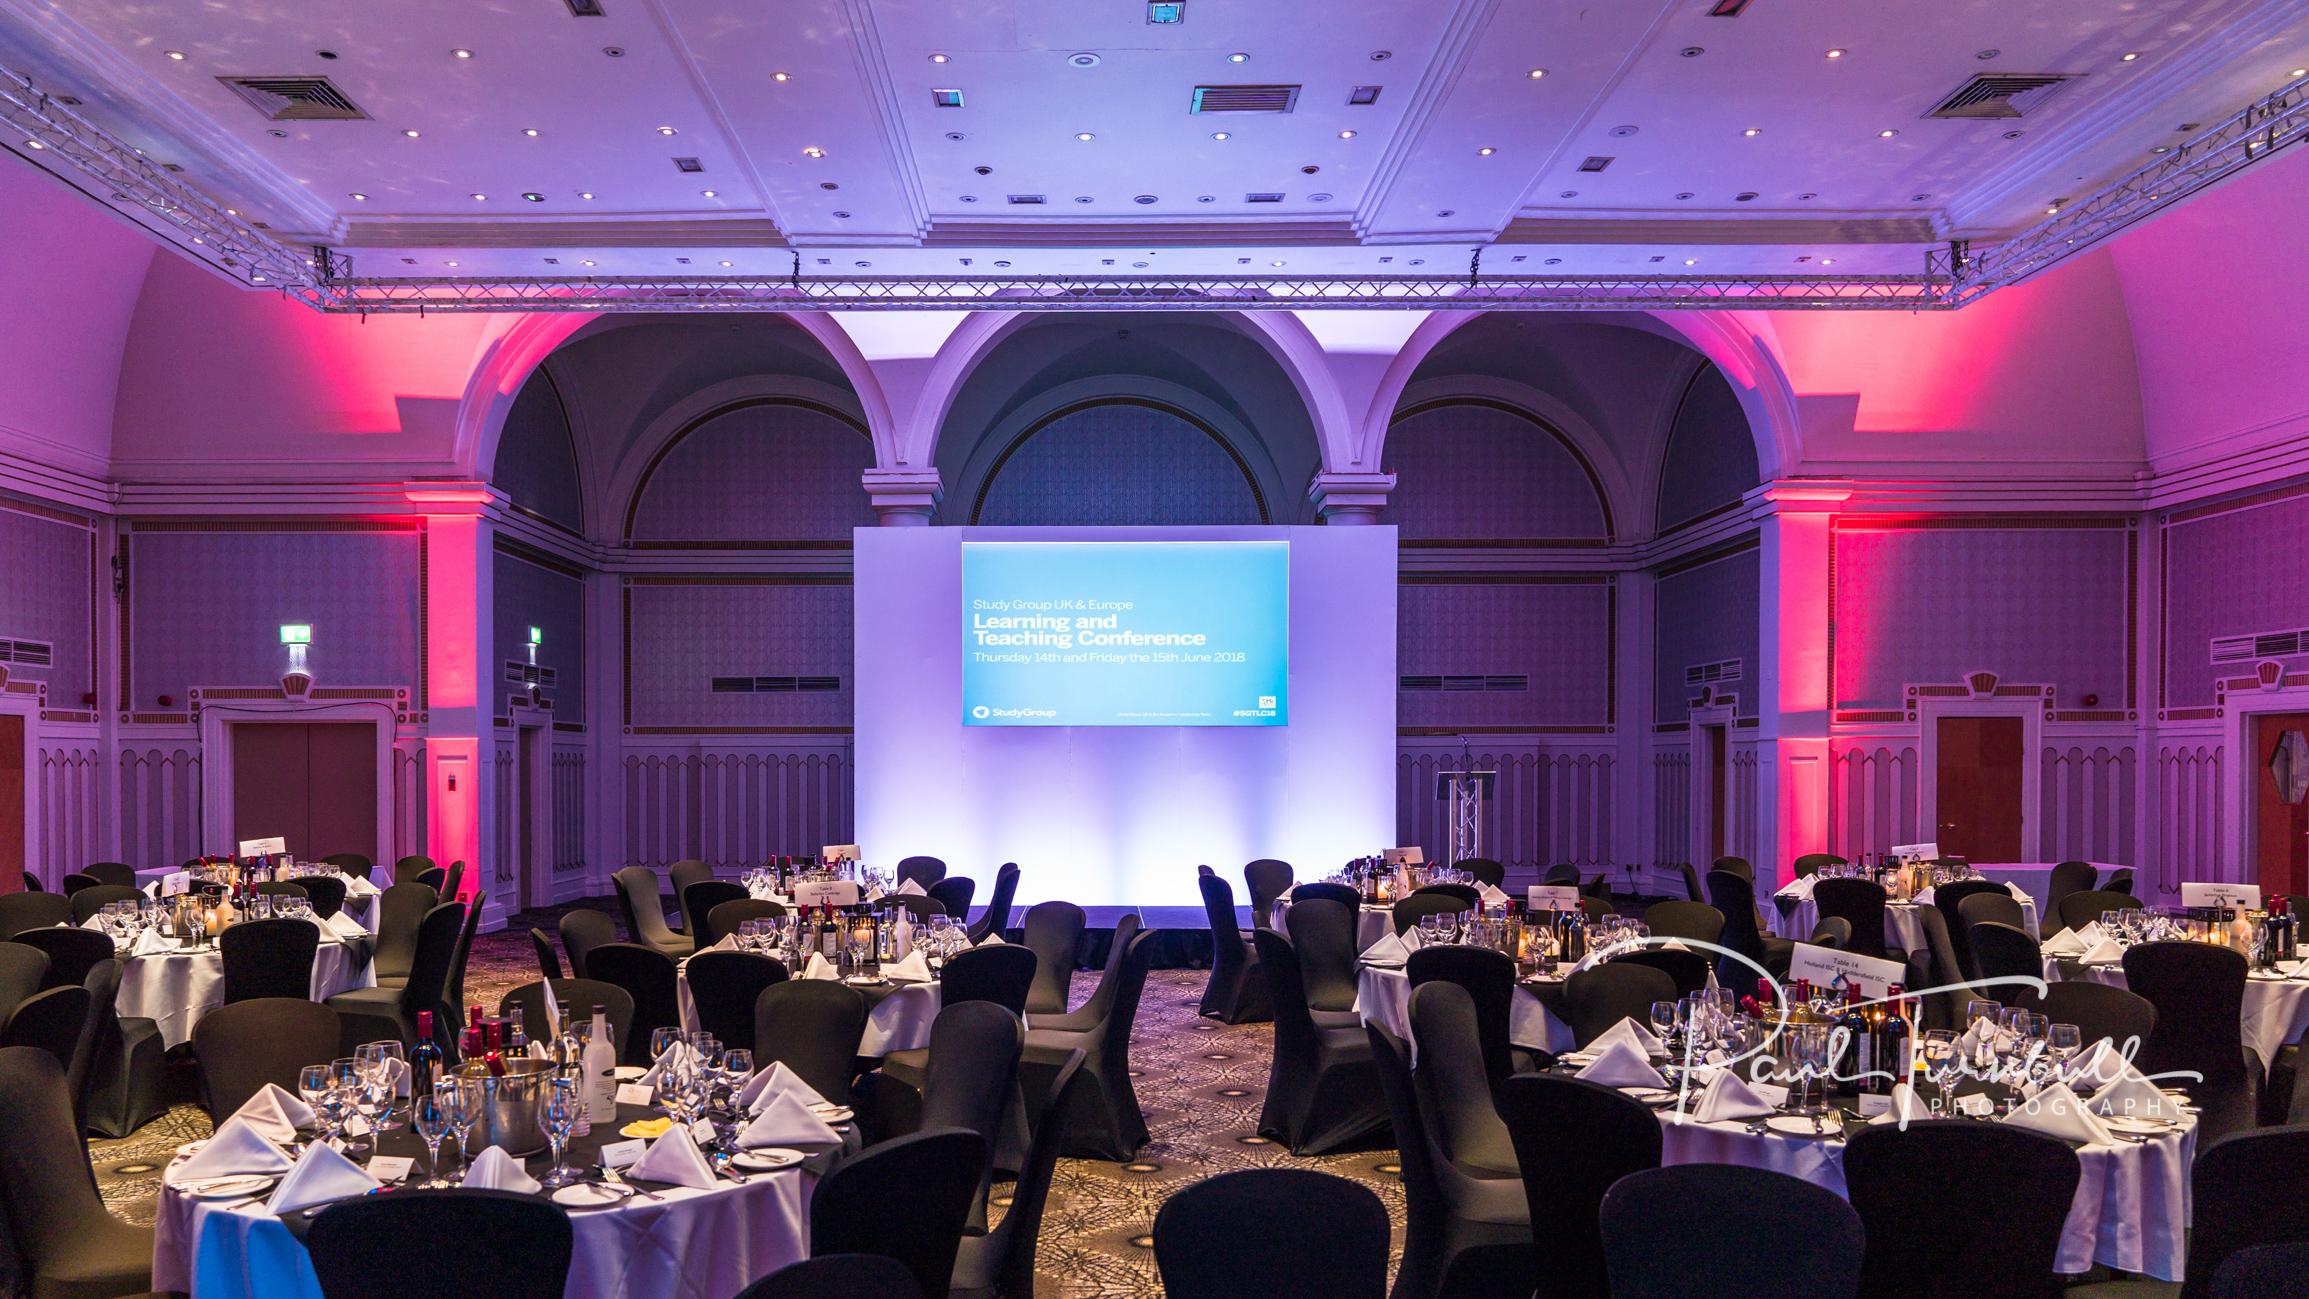 conference-event-photographer-queens-hotel-leeds-yorkshire-002.jpg